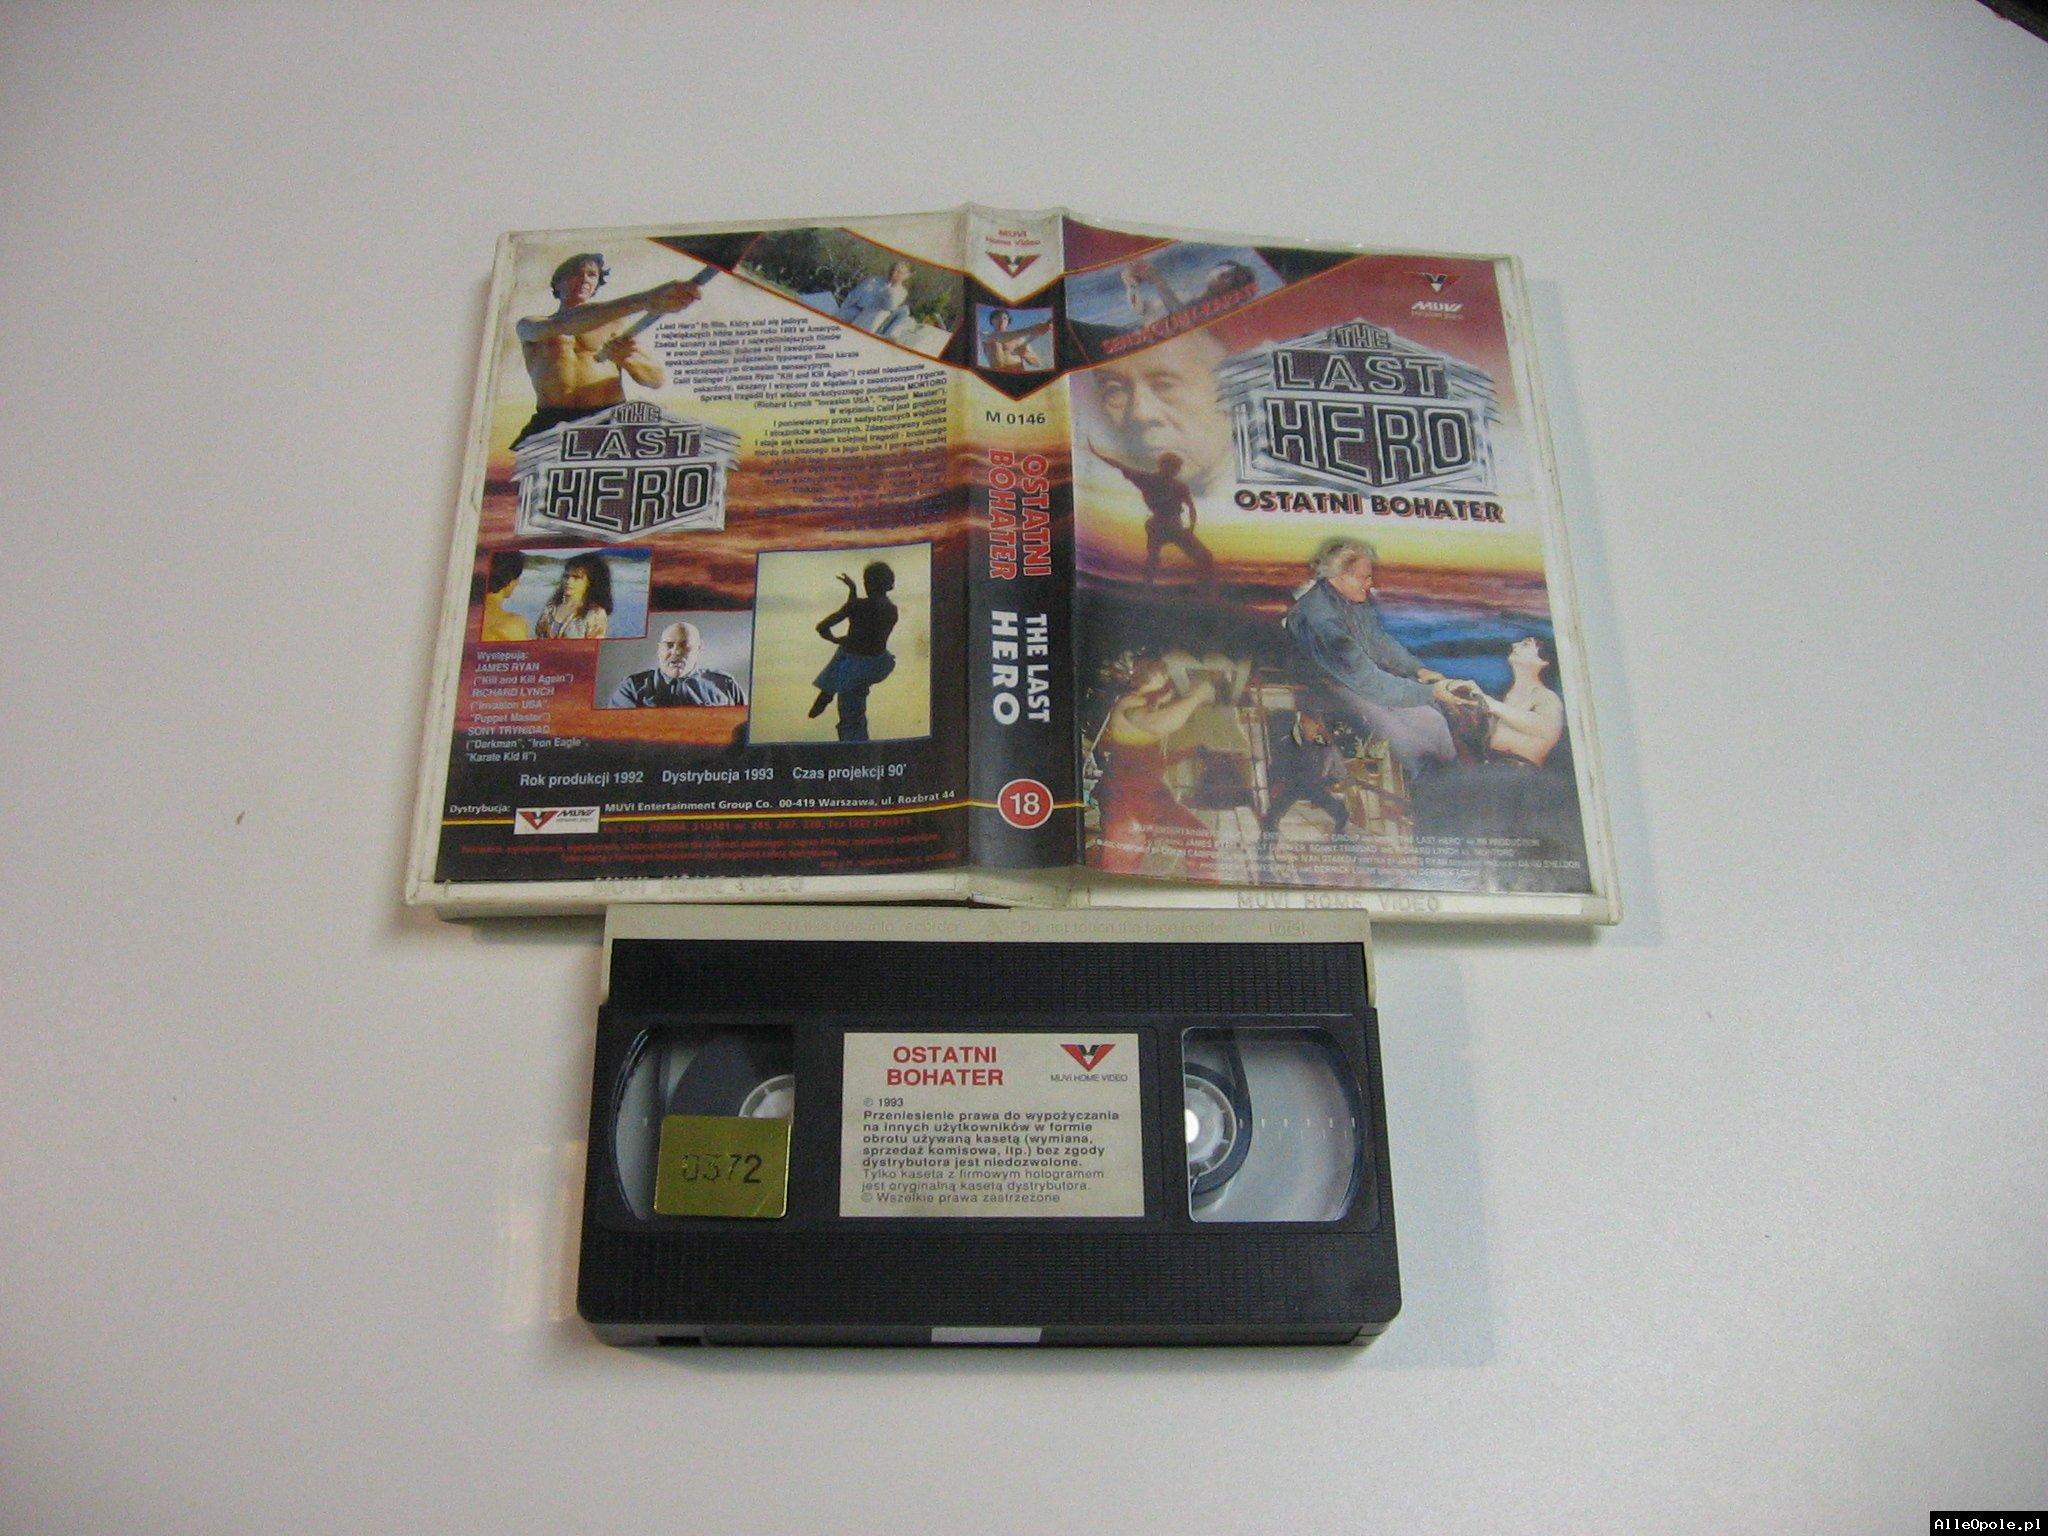 OSTATNI BOCHATER - VHS Kaseta Video - Opole 1809